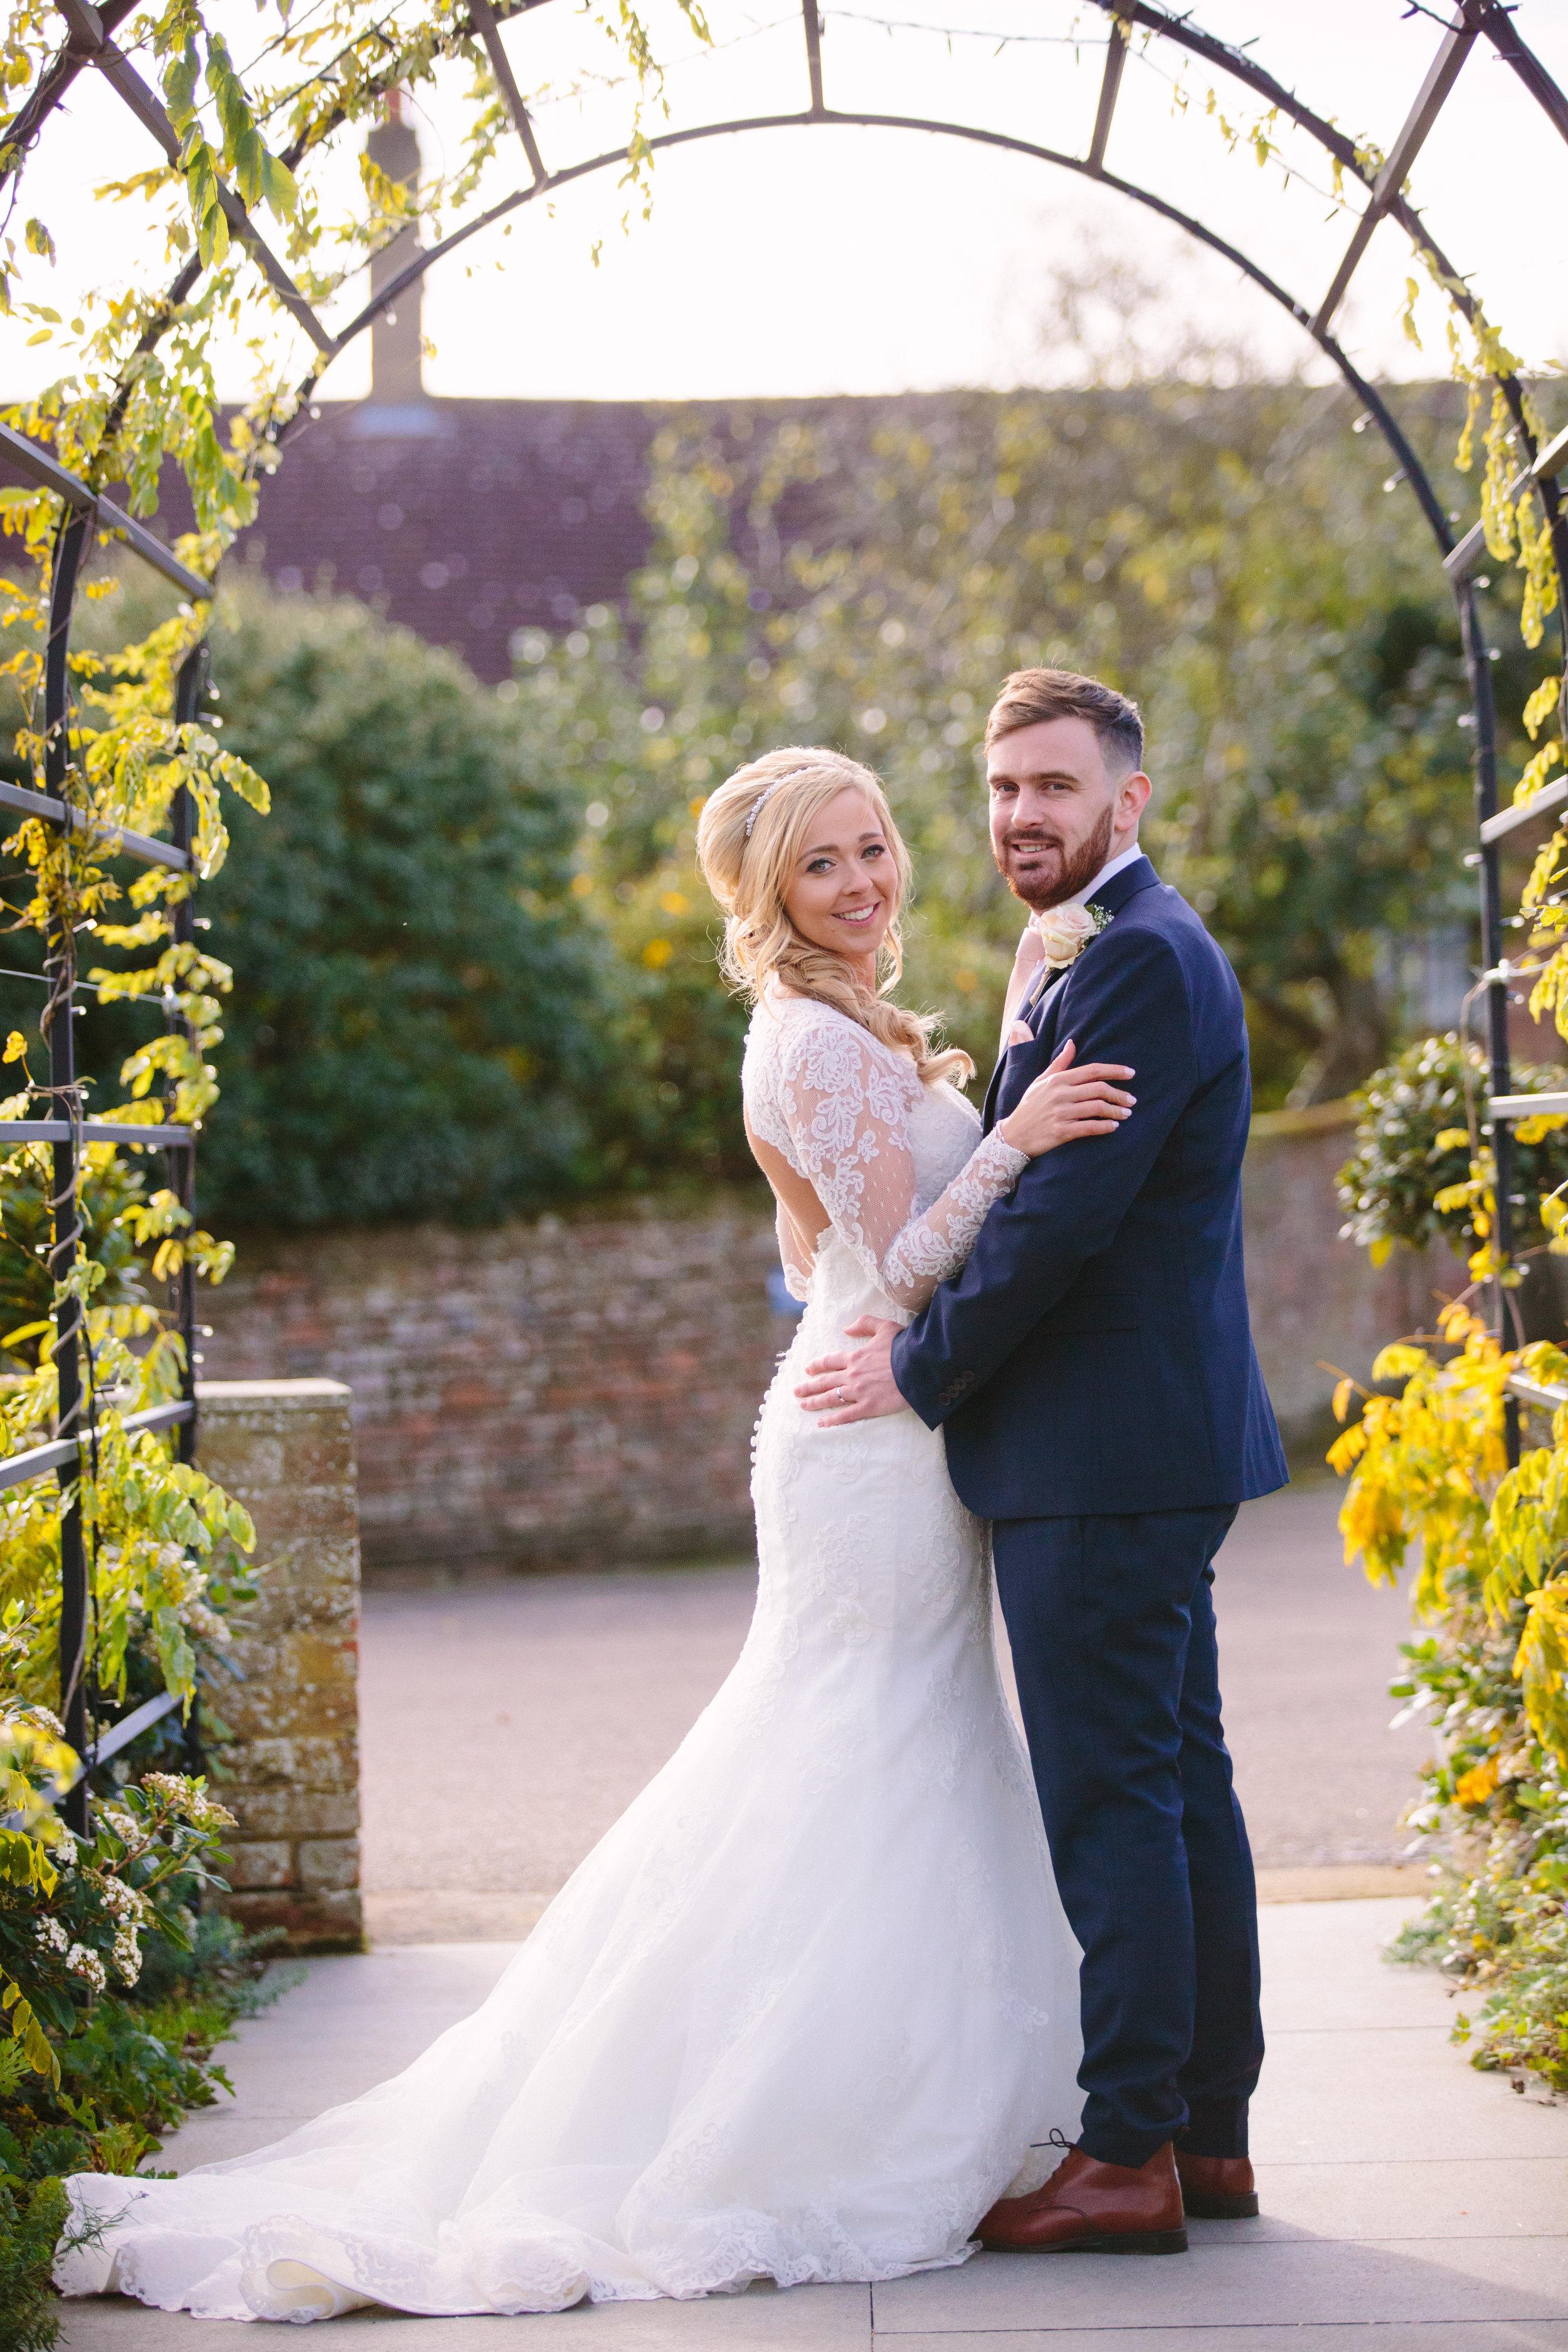 london-hertfordshire-wedding-photography-milling-barn-portrait-59